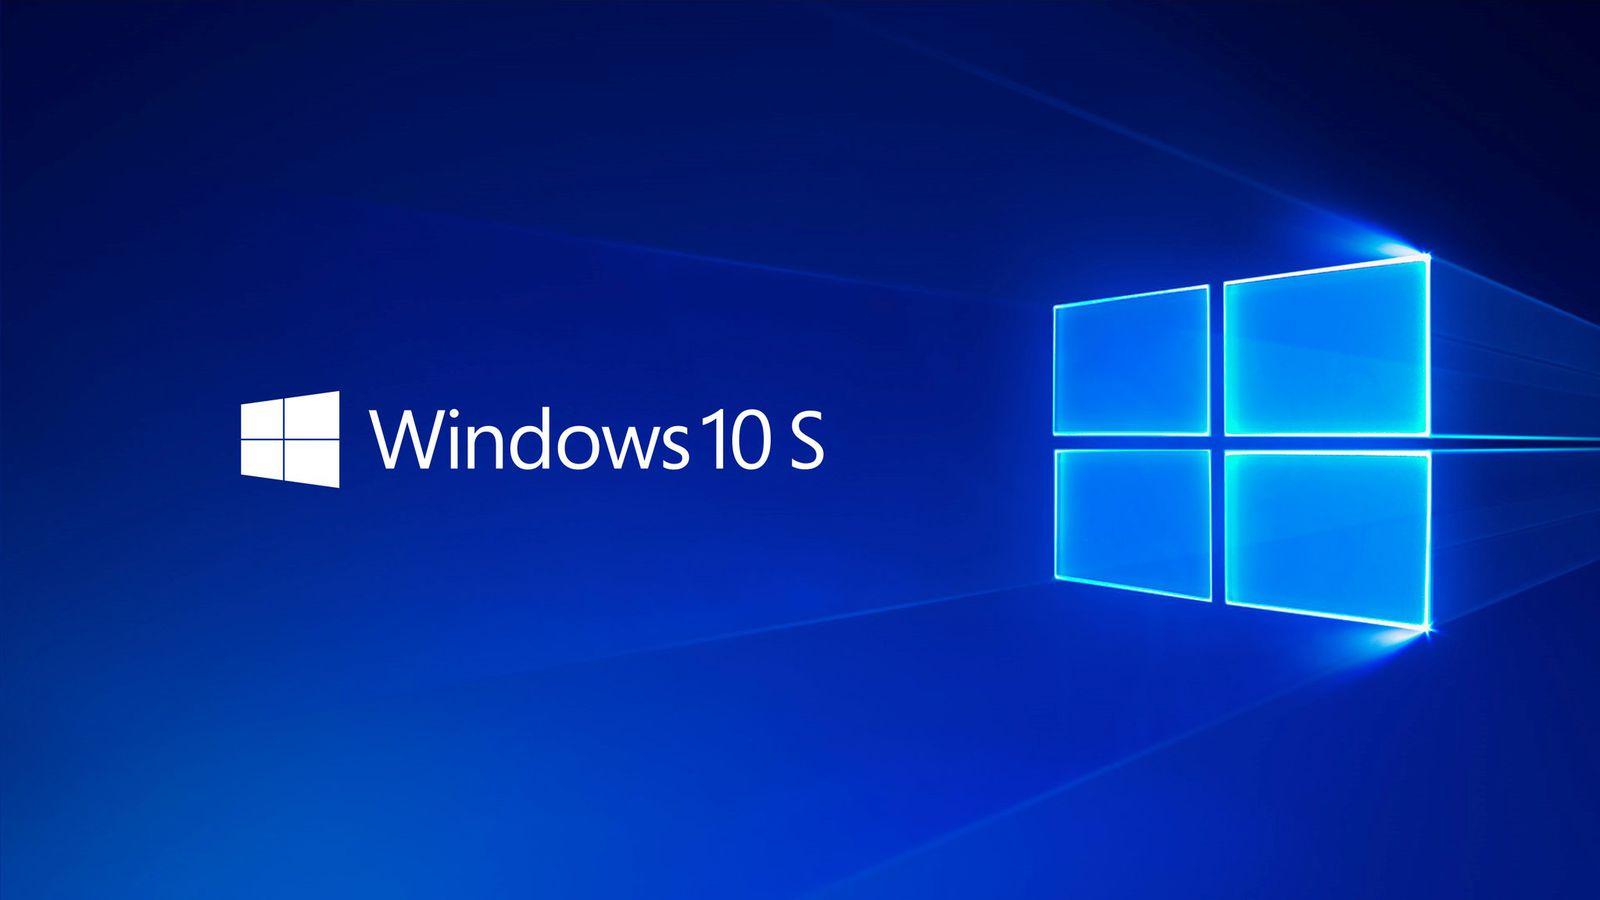 Windows 10 Maus Hakt